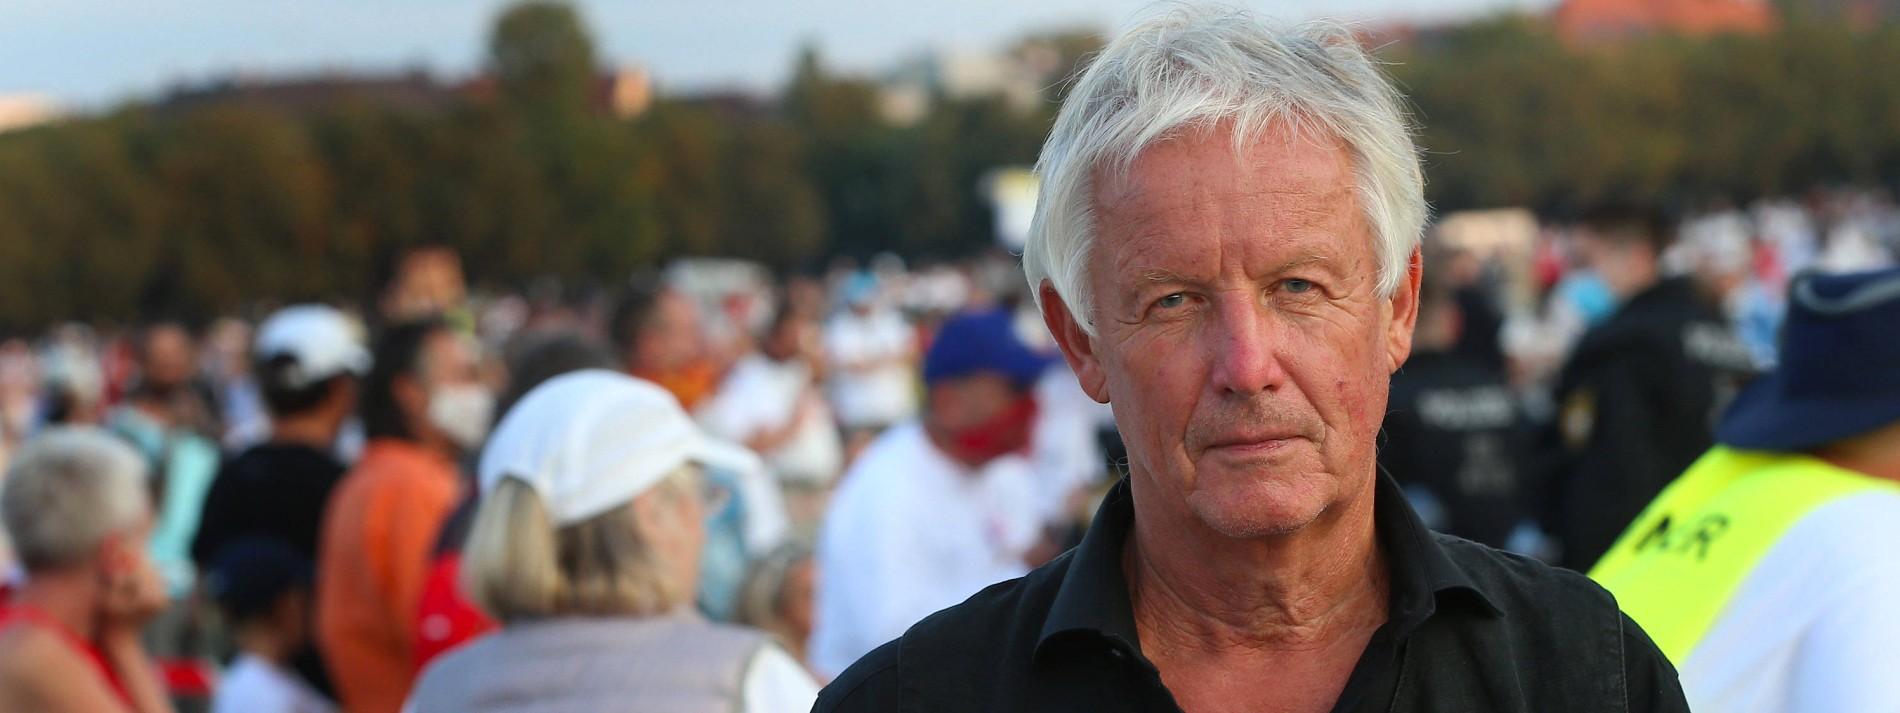 Früherer Fernsehpfarrer Jürgen Fliege in Corona-Protest-Partei